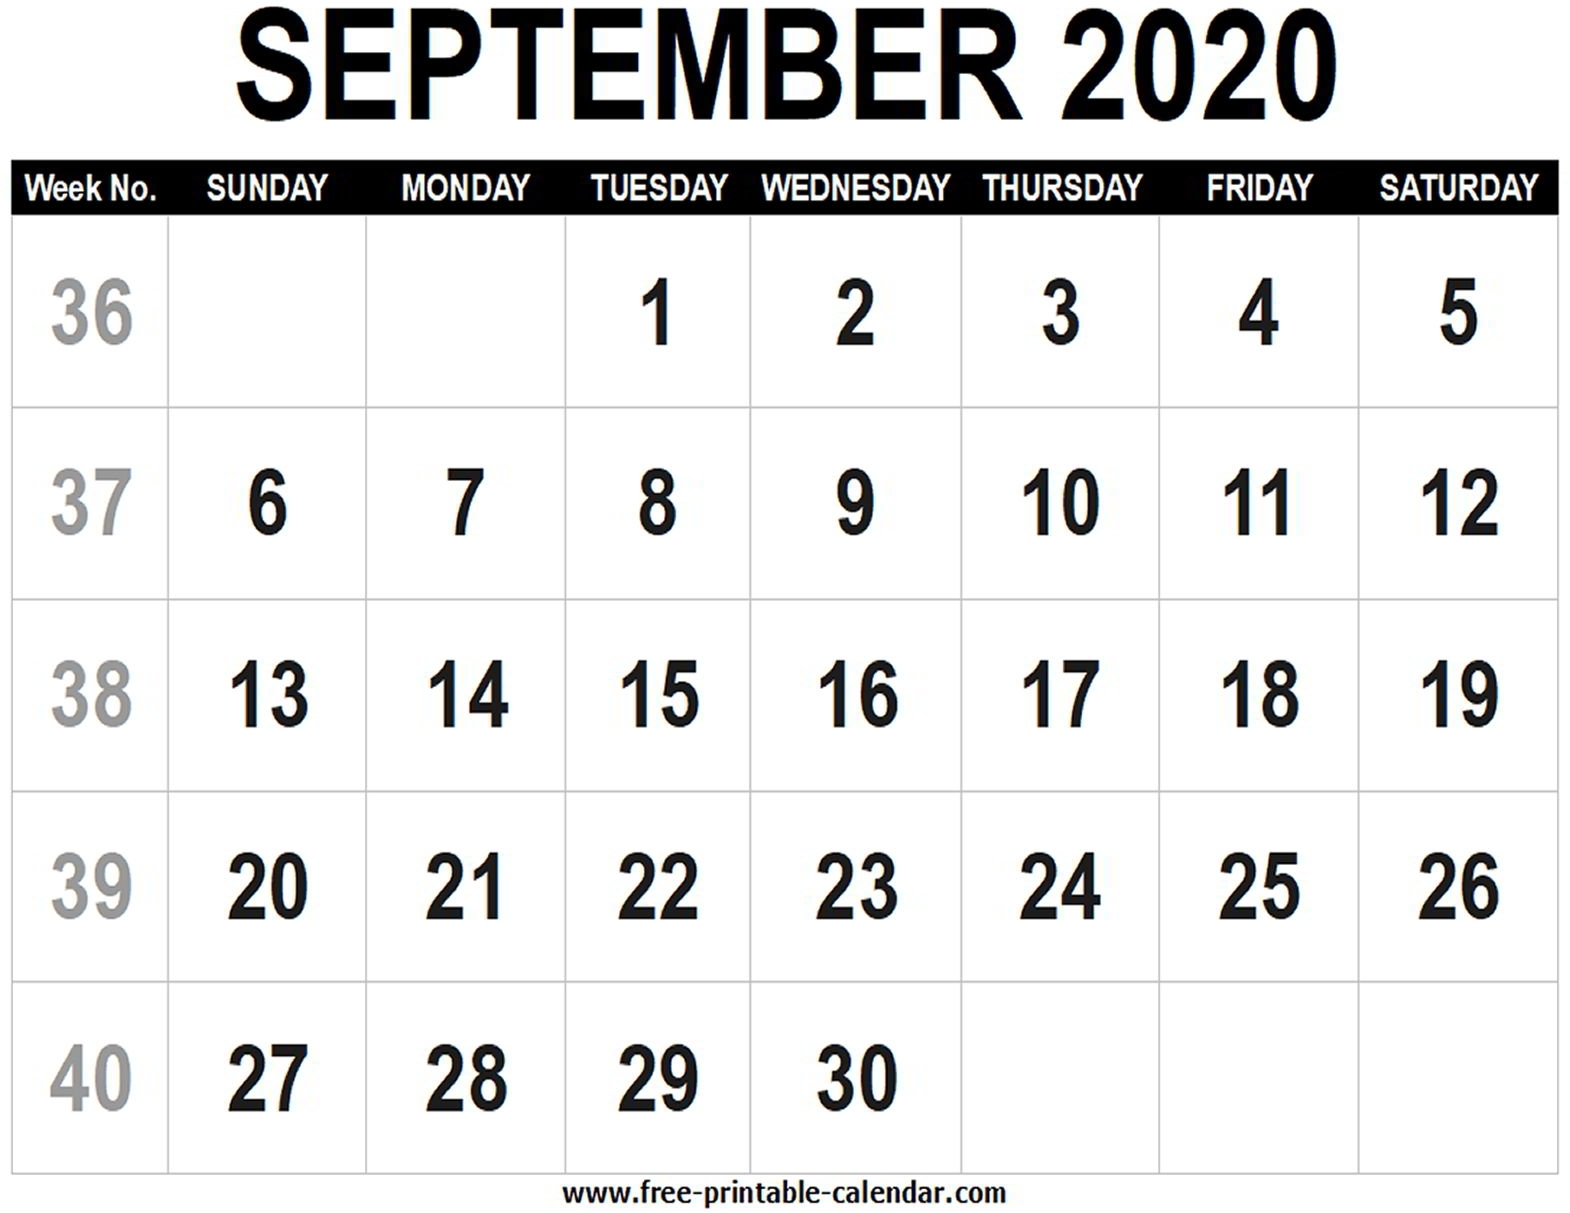 Blank Calendar 2020 September - Free-Printable-Calendar